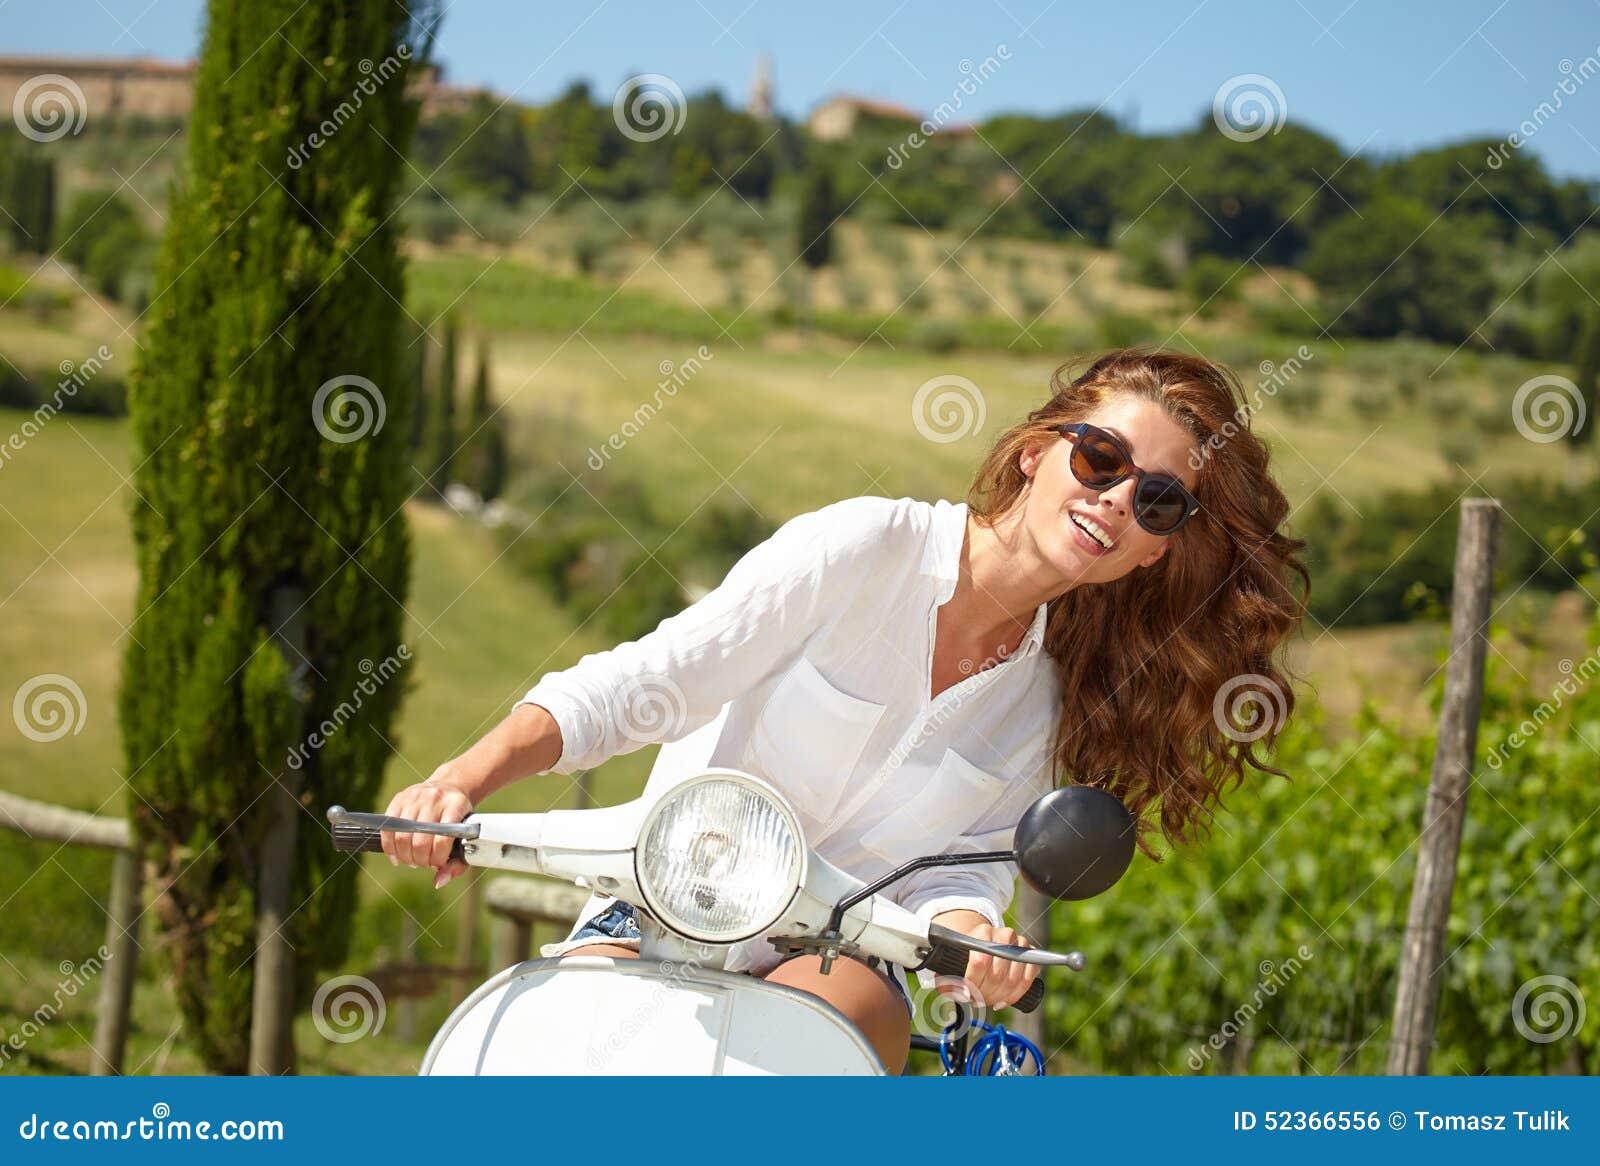 Mulher italiana que senta-se em um  trotinette  italiano